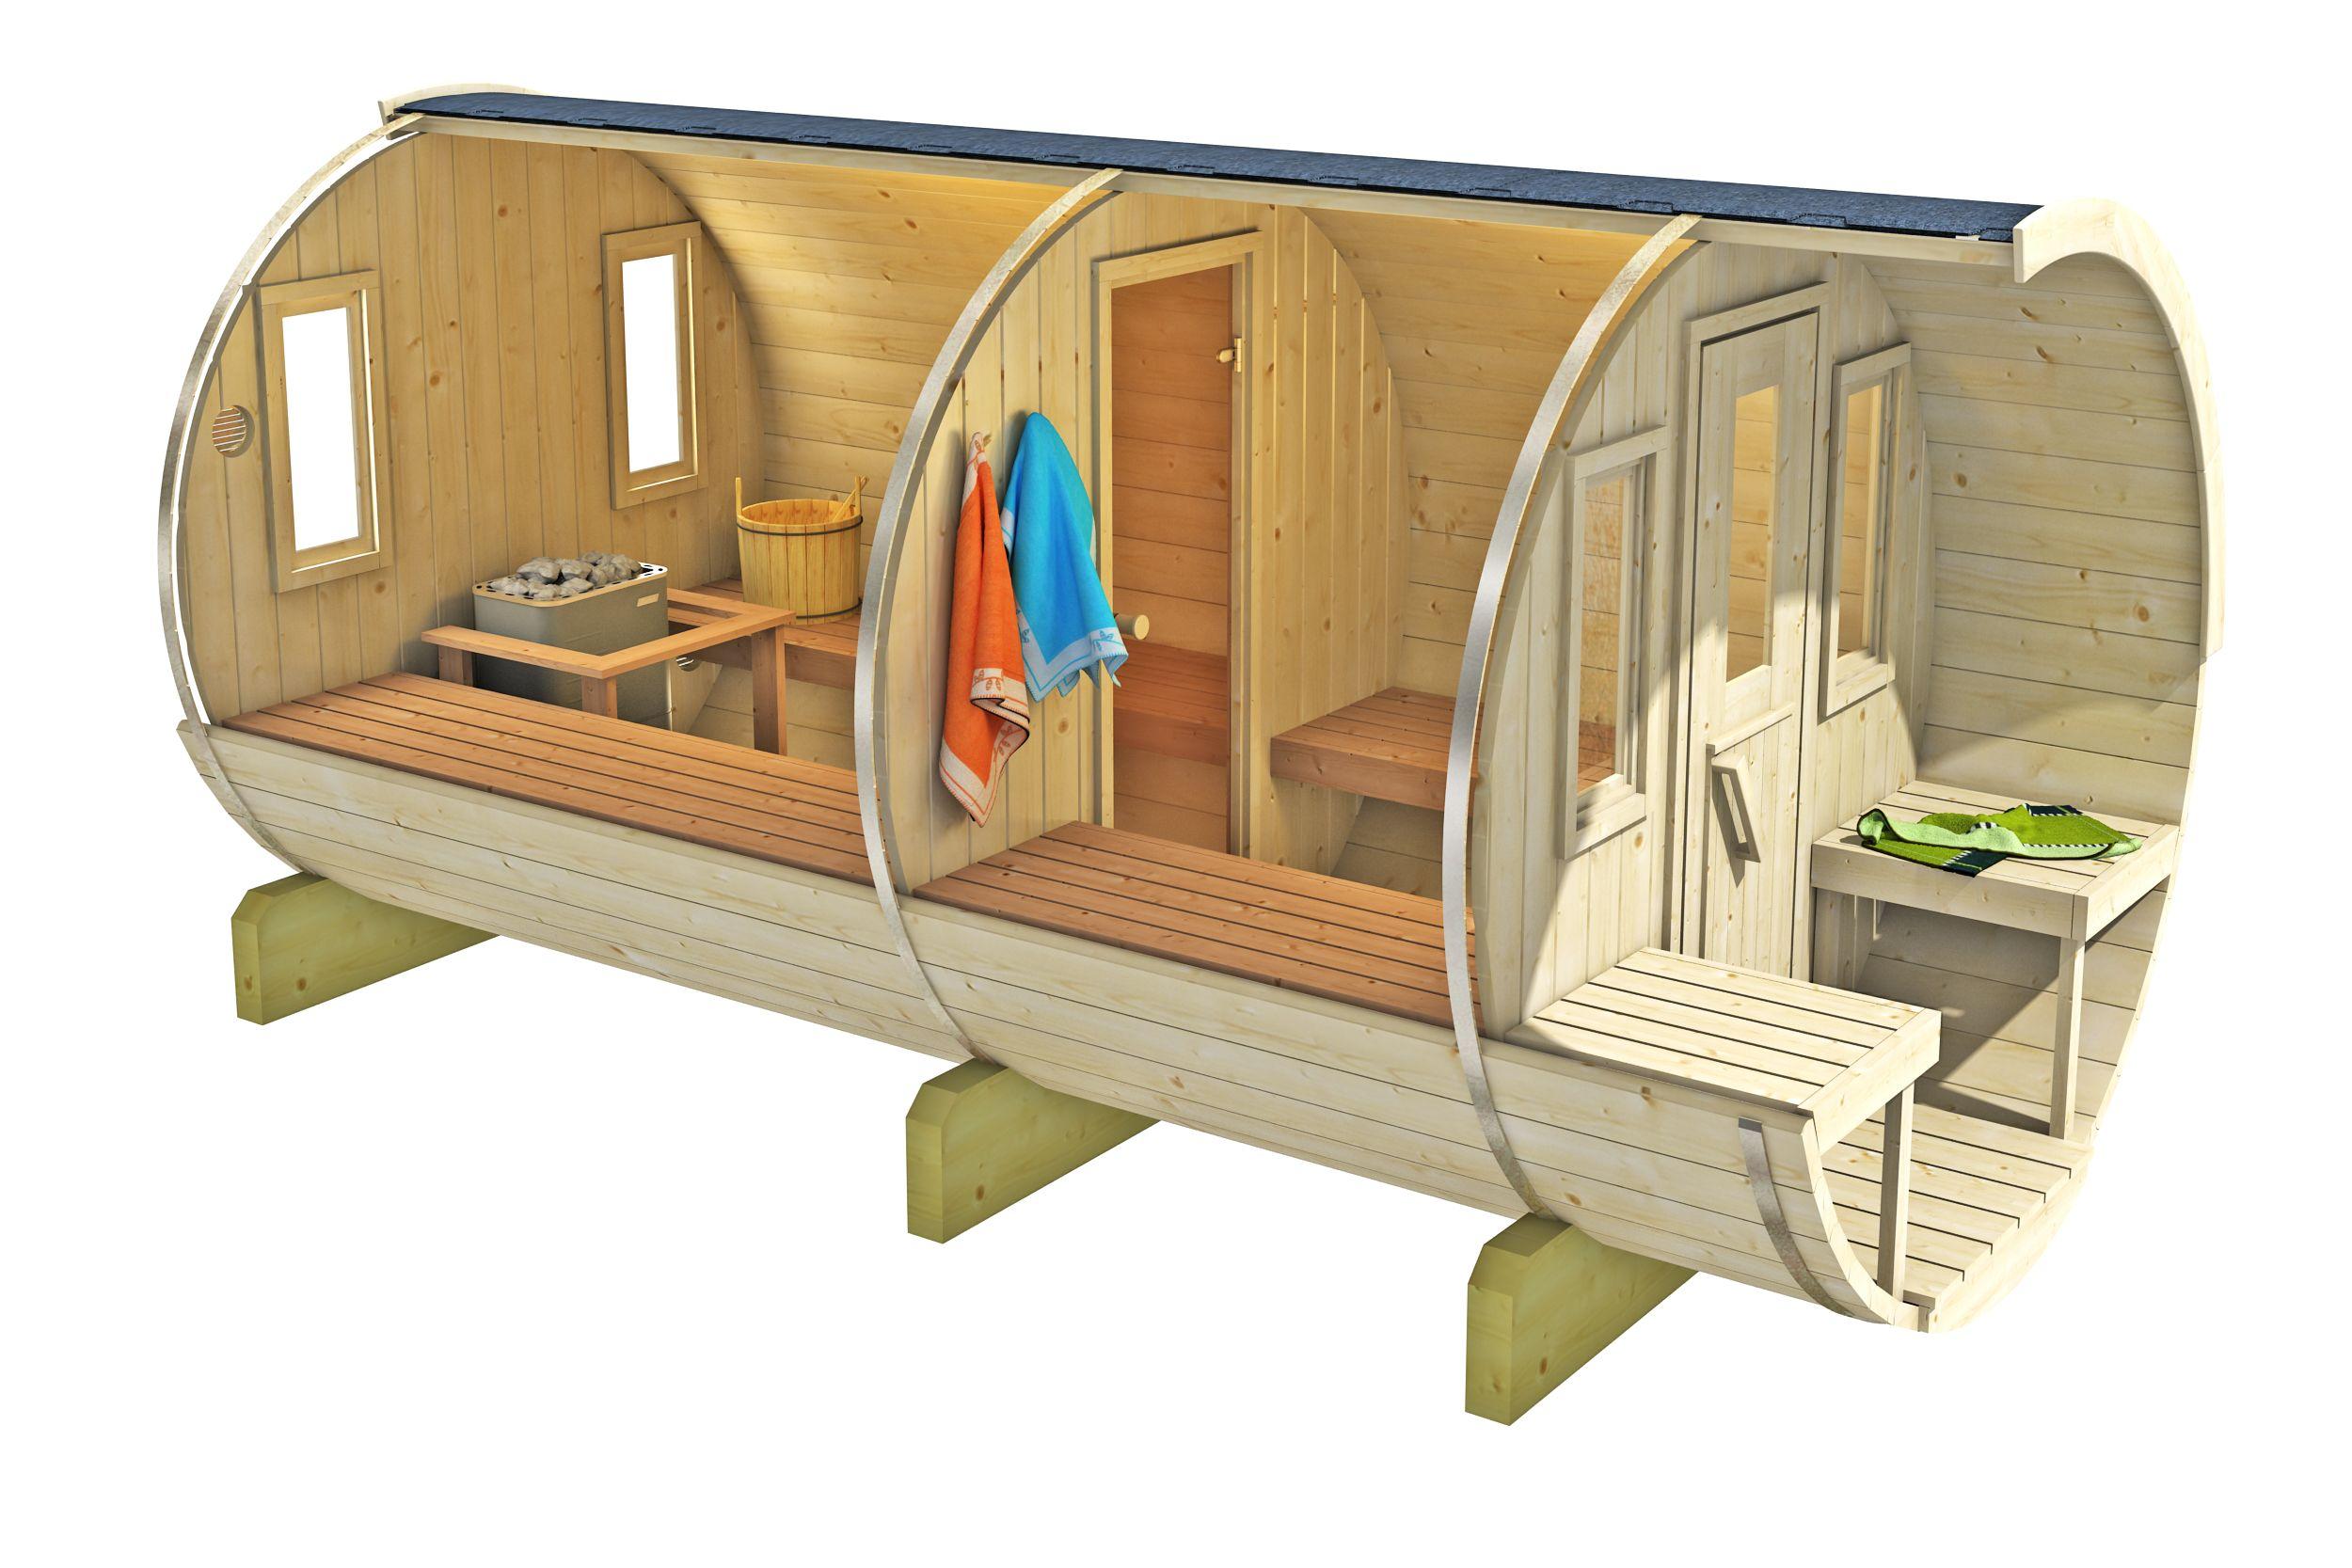 Finn Art FassSauna Jori 1 Diy sauna, Fasssauna